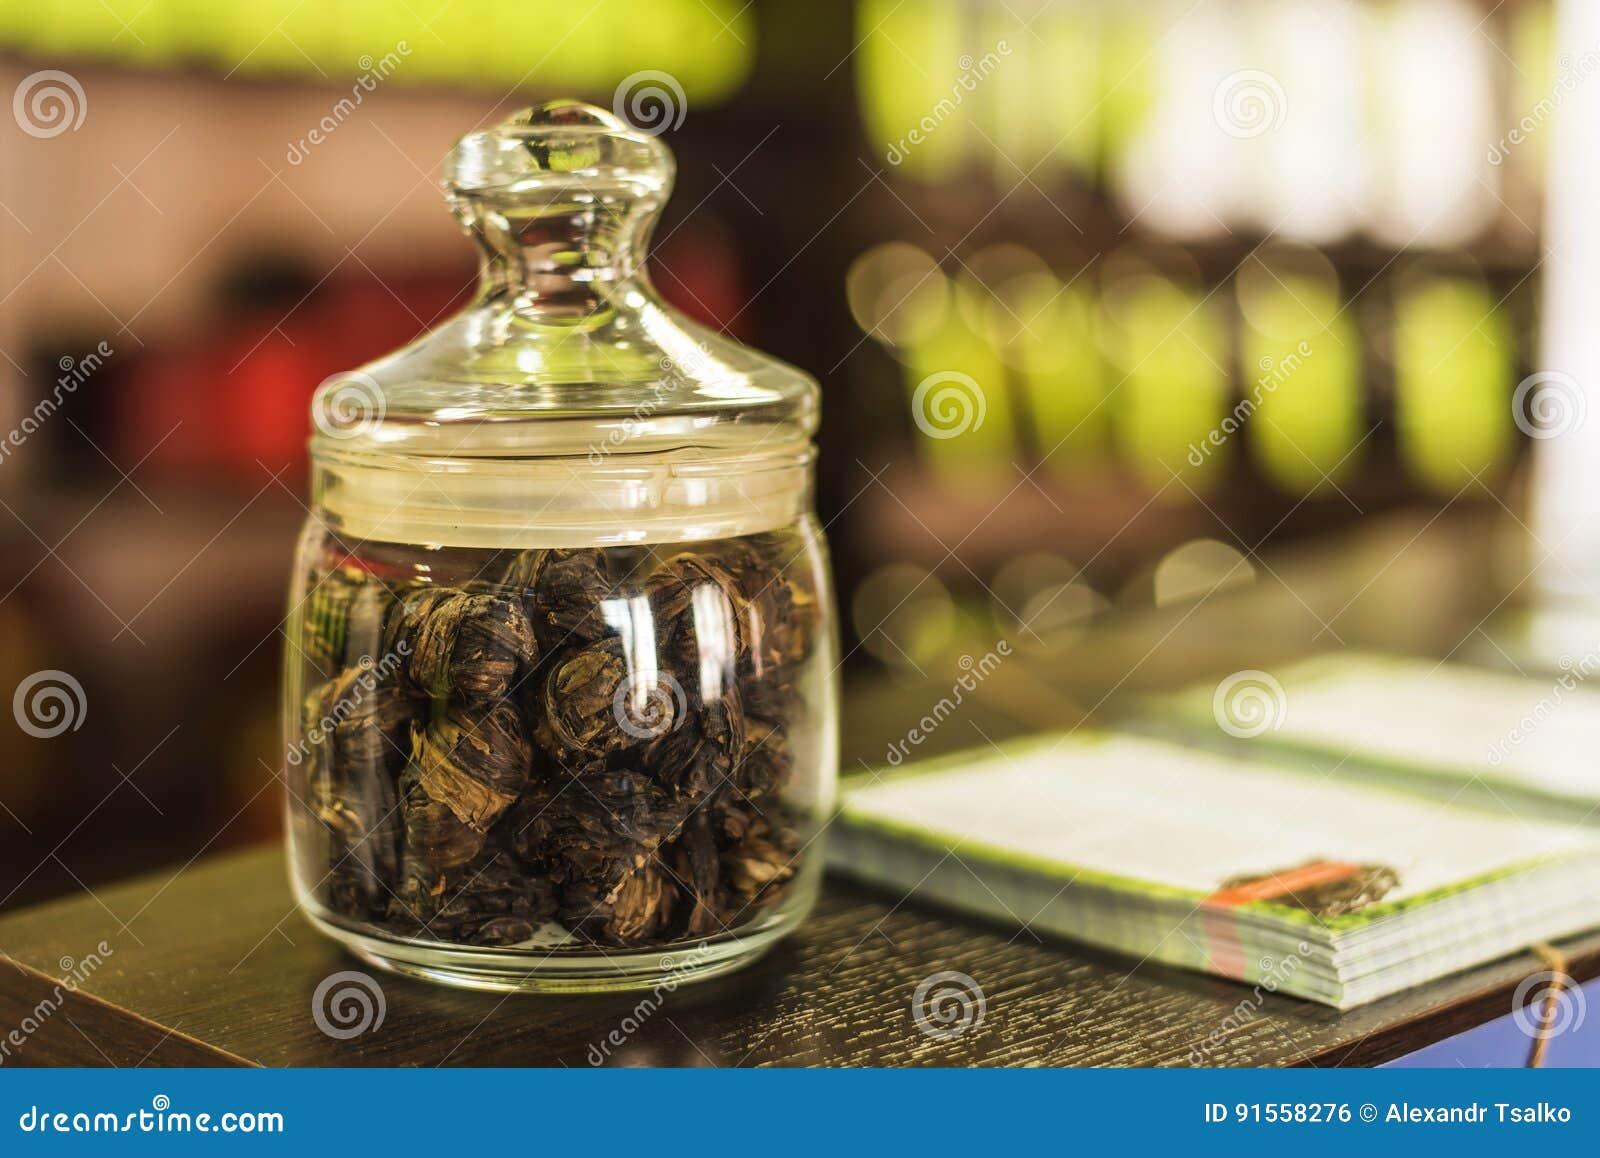 Japanese Coffee Mugs A Pot Of Tea Is On The Counter Stock Photo Cartoondealer